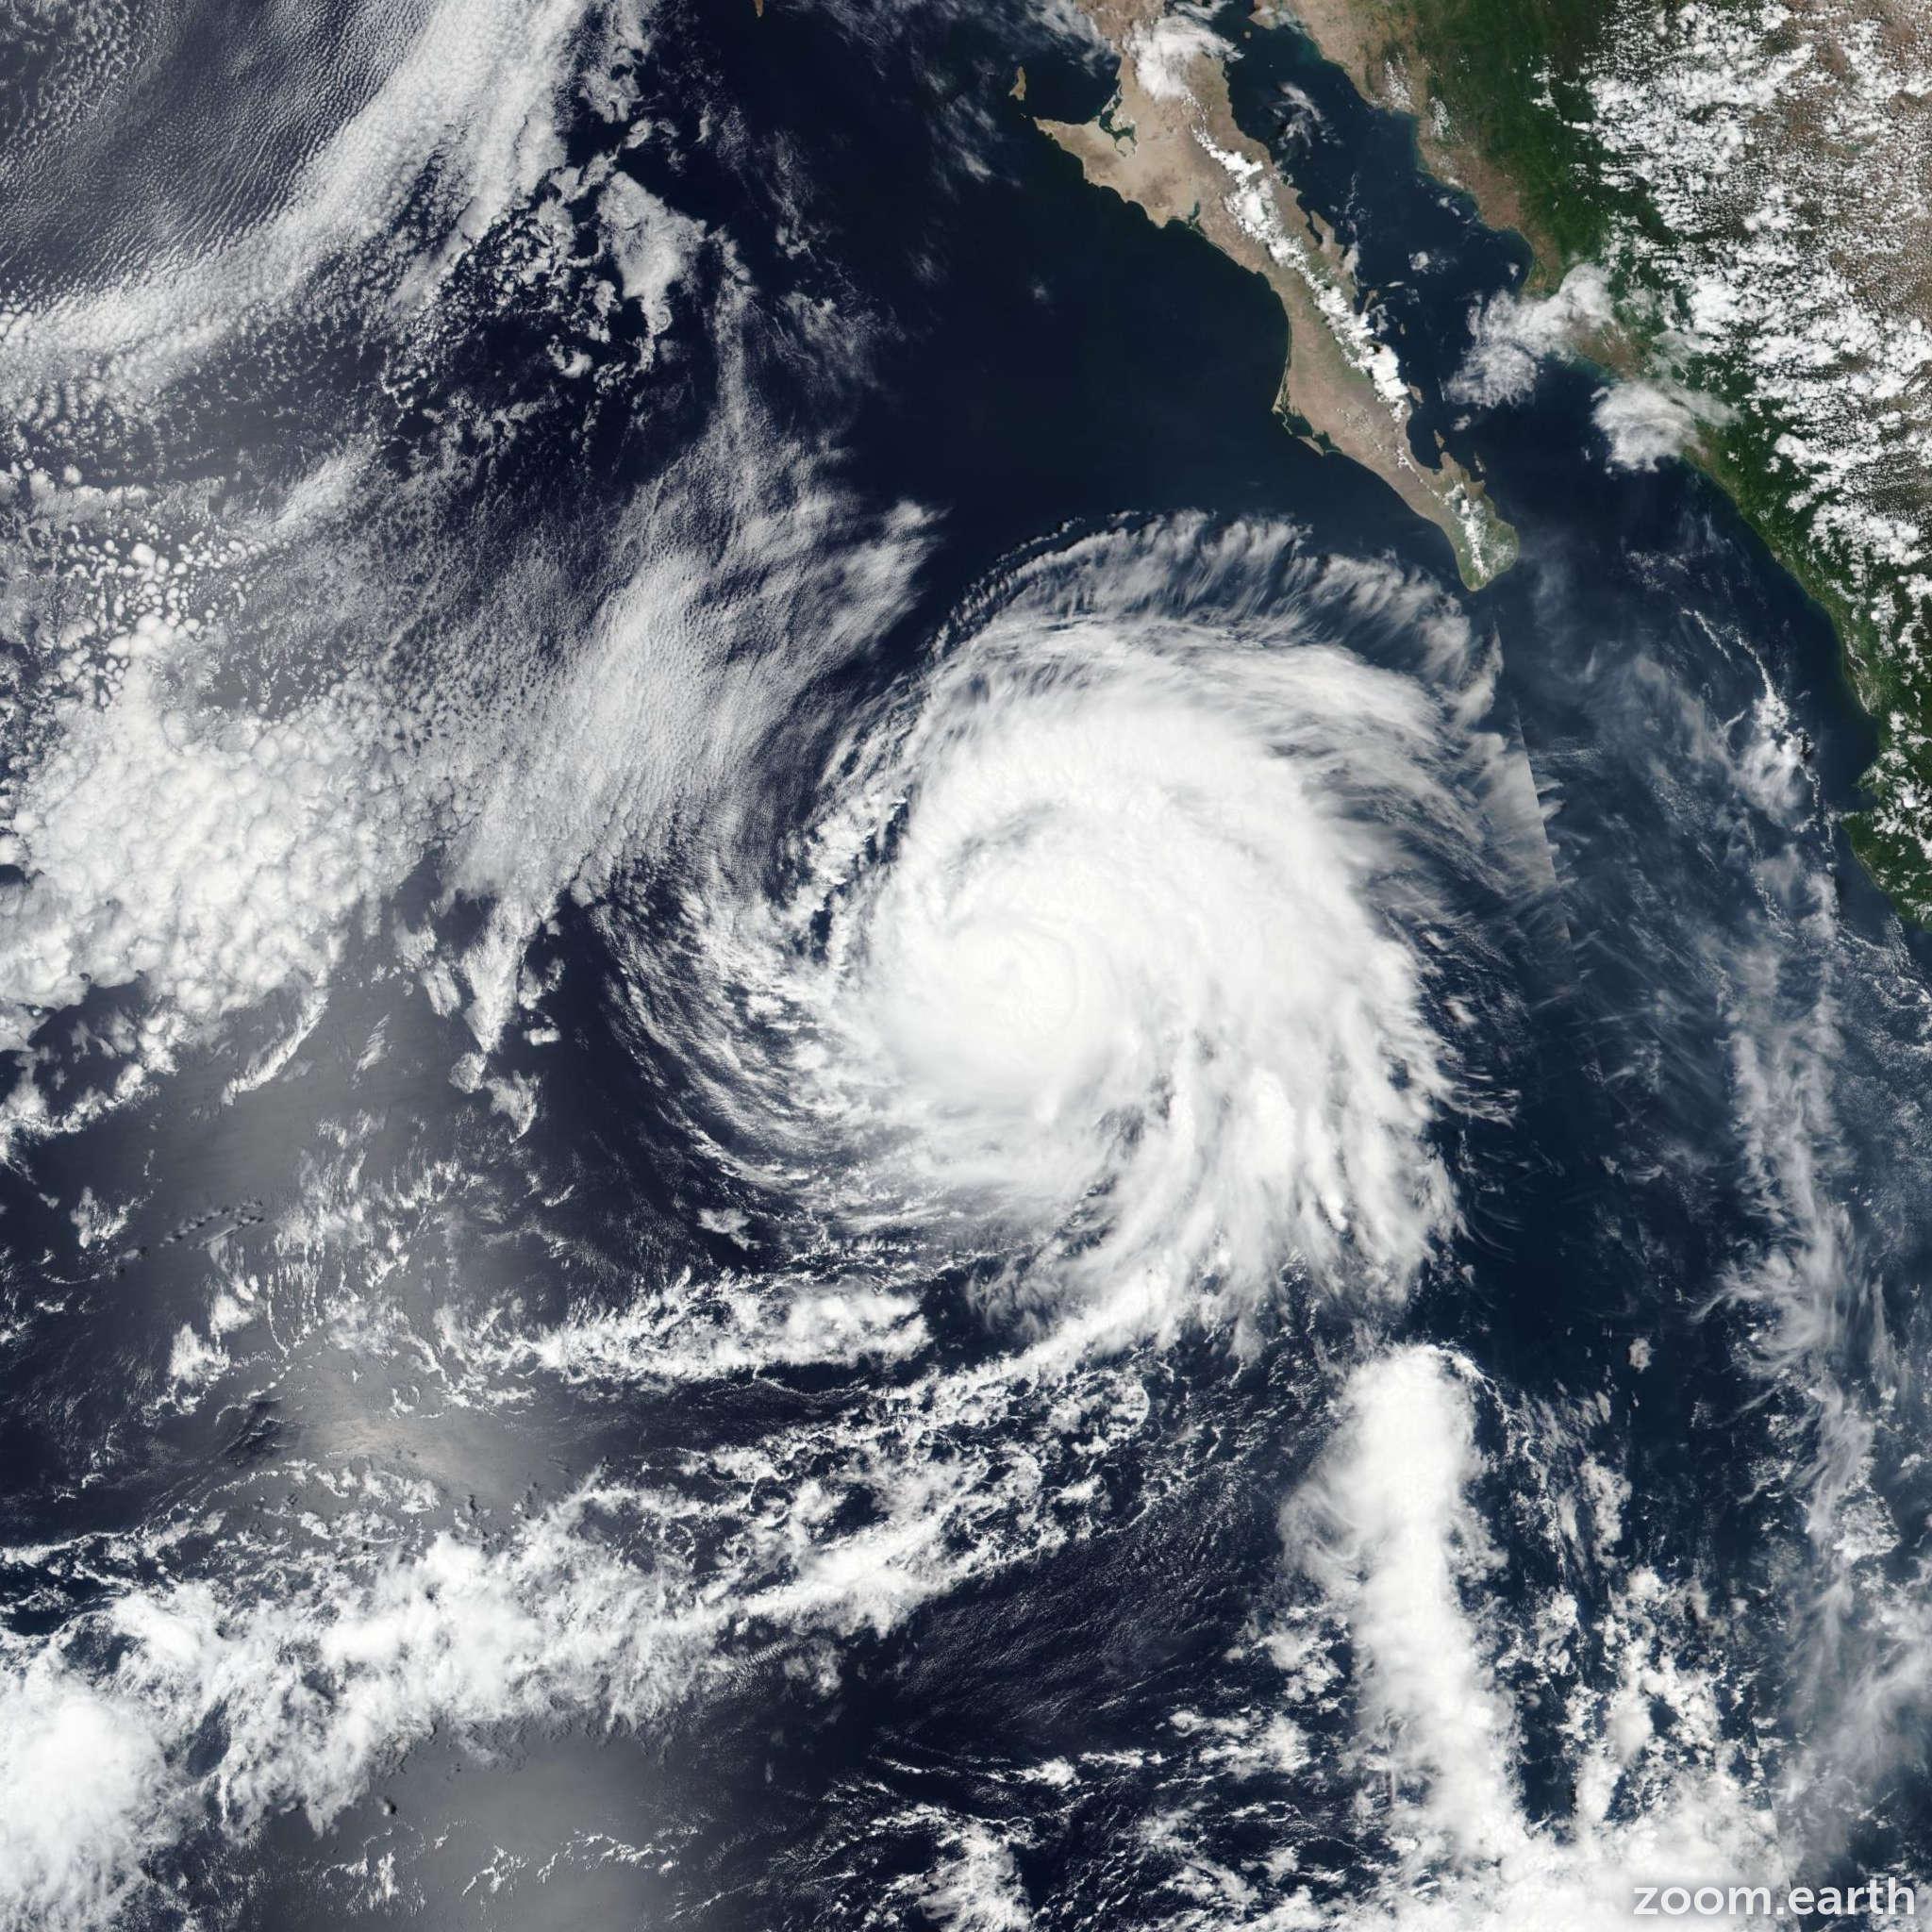 Satellite image of Hurricane Juliette 2019